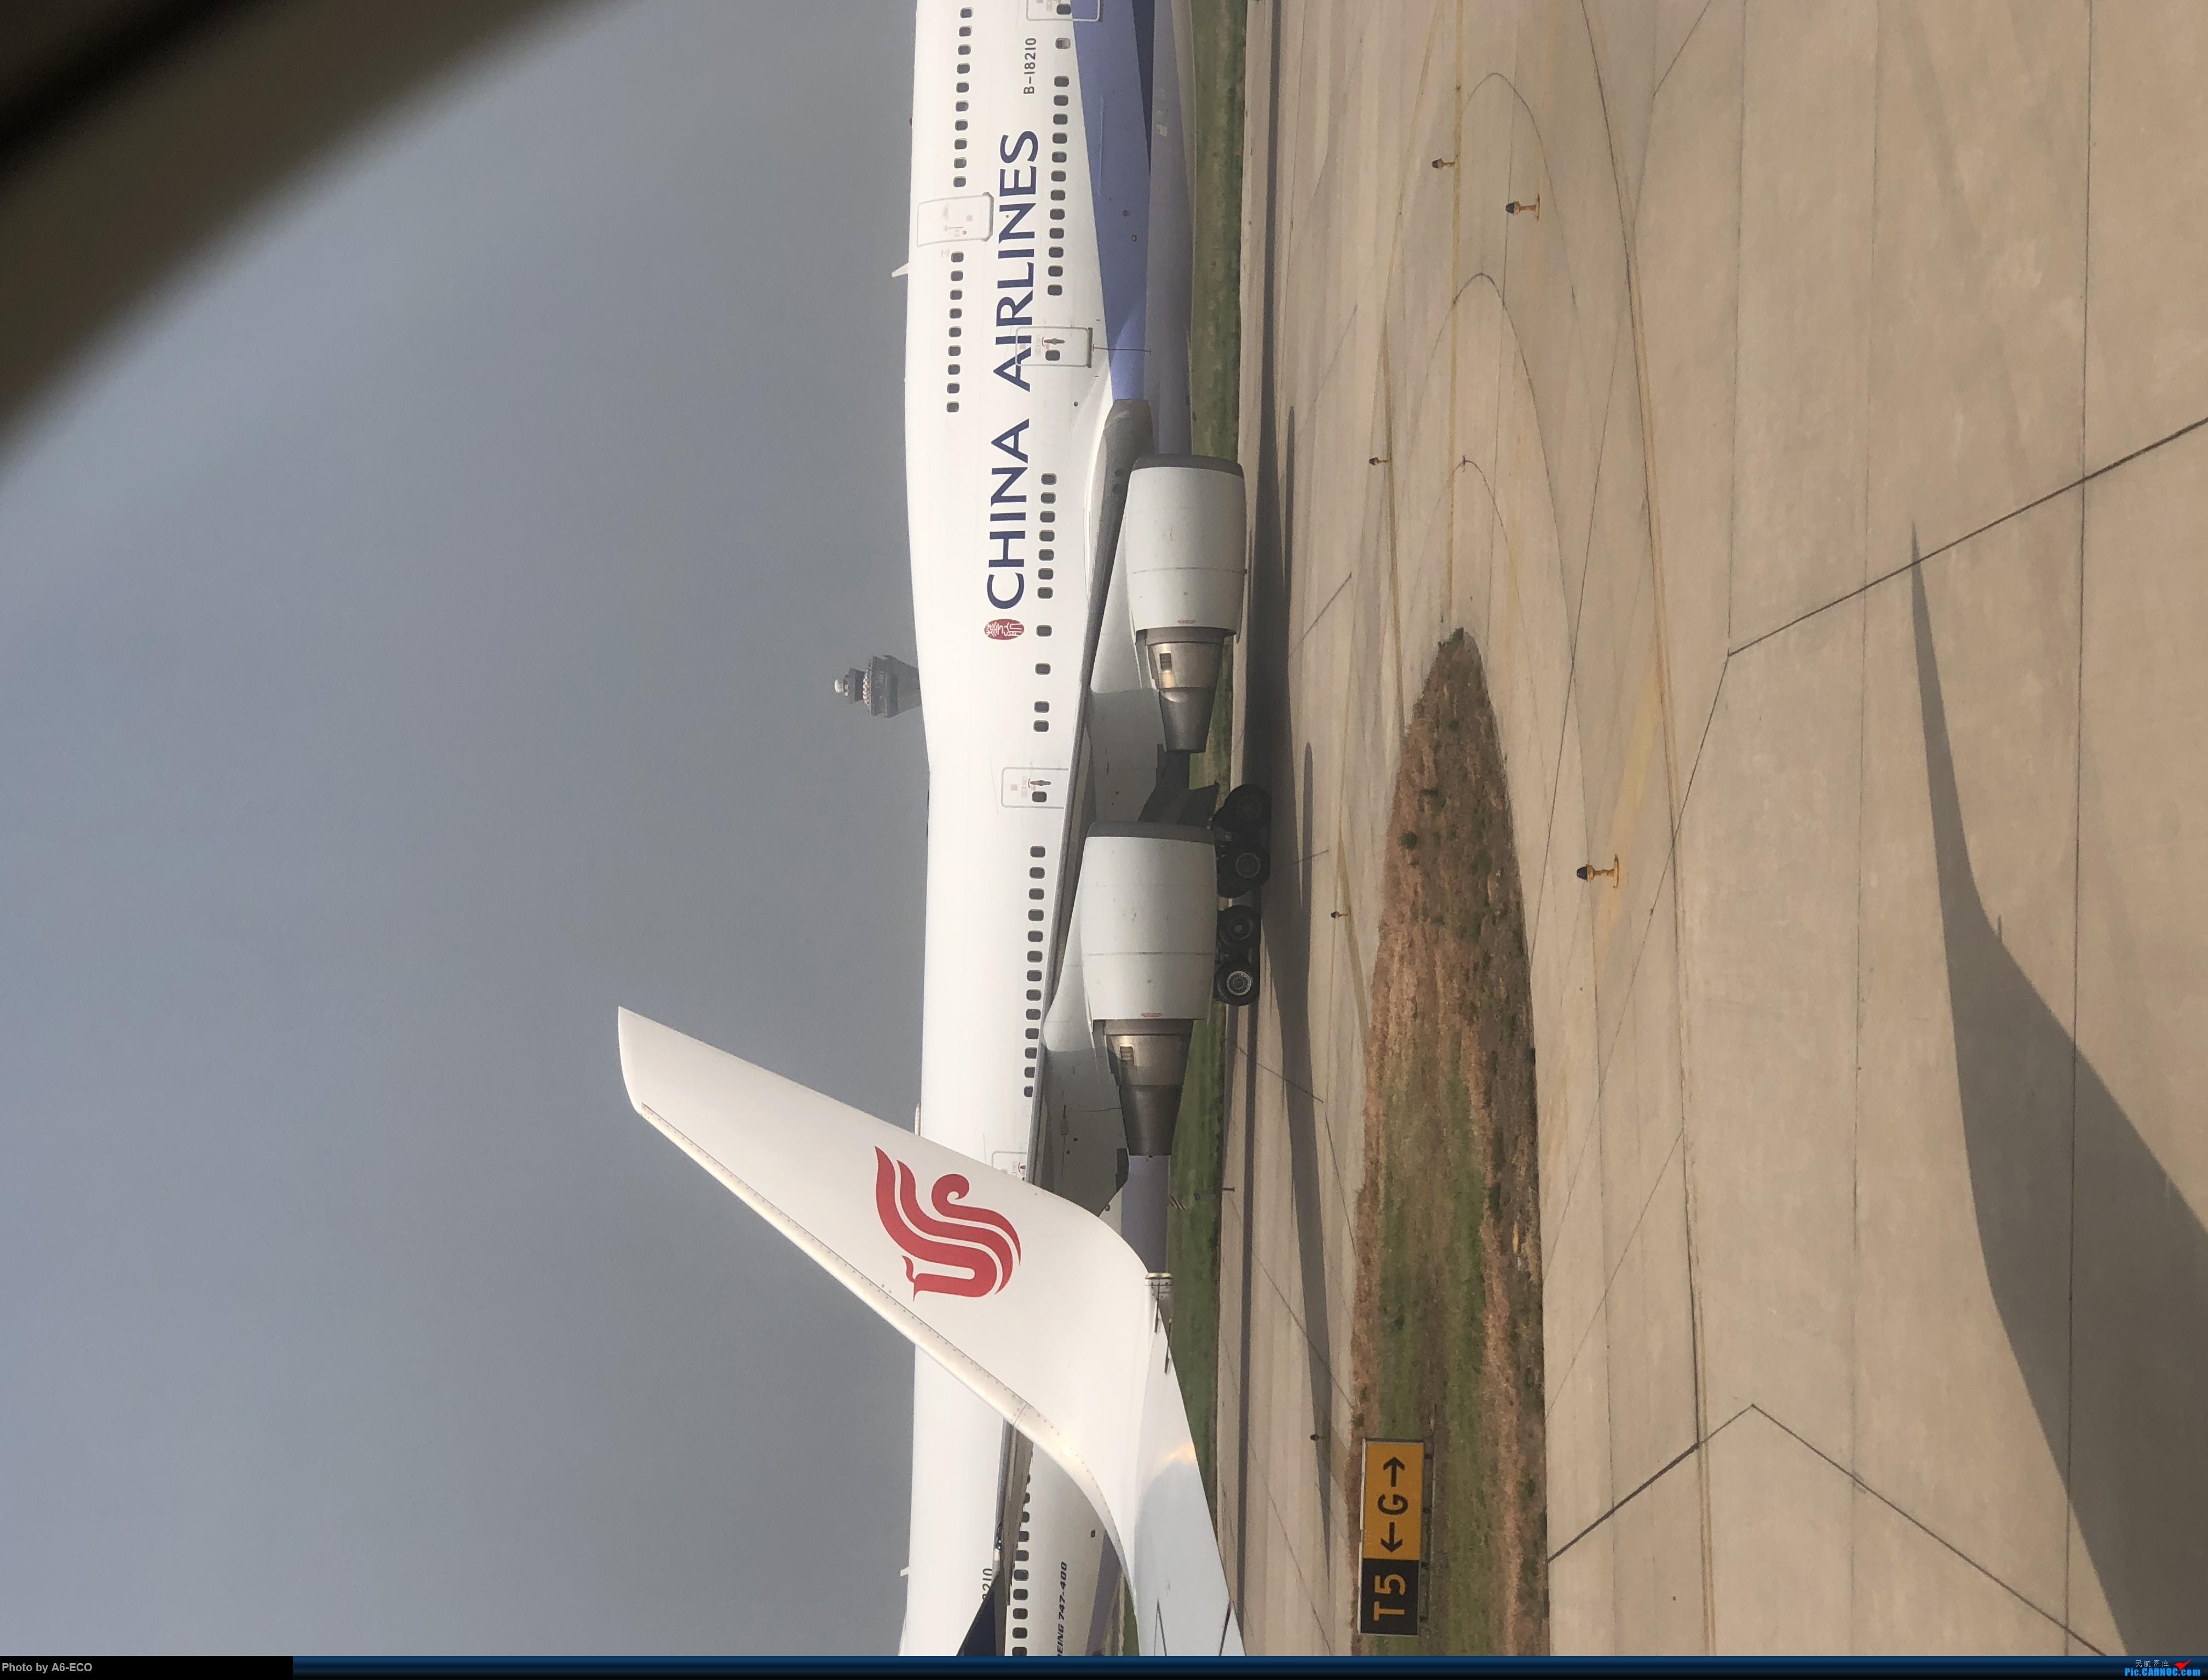 Re:[原创]【CAN】东跑常规货及加卤蛋复古. BOEING 747-400 B-18210 中国北京首都国际机场